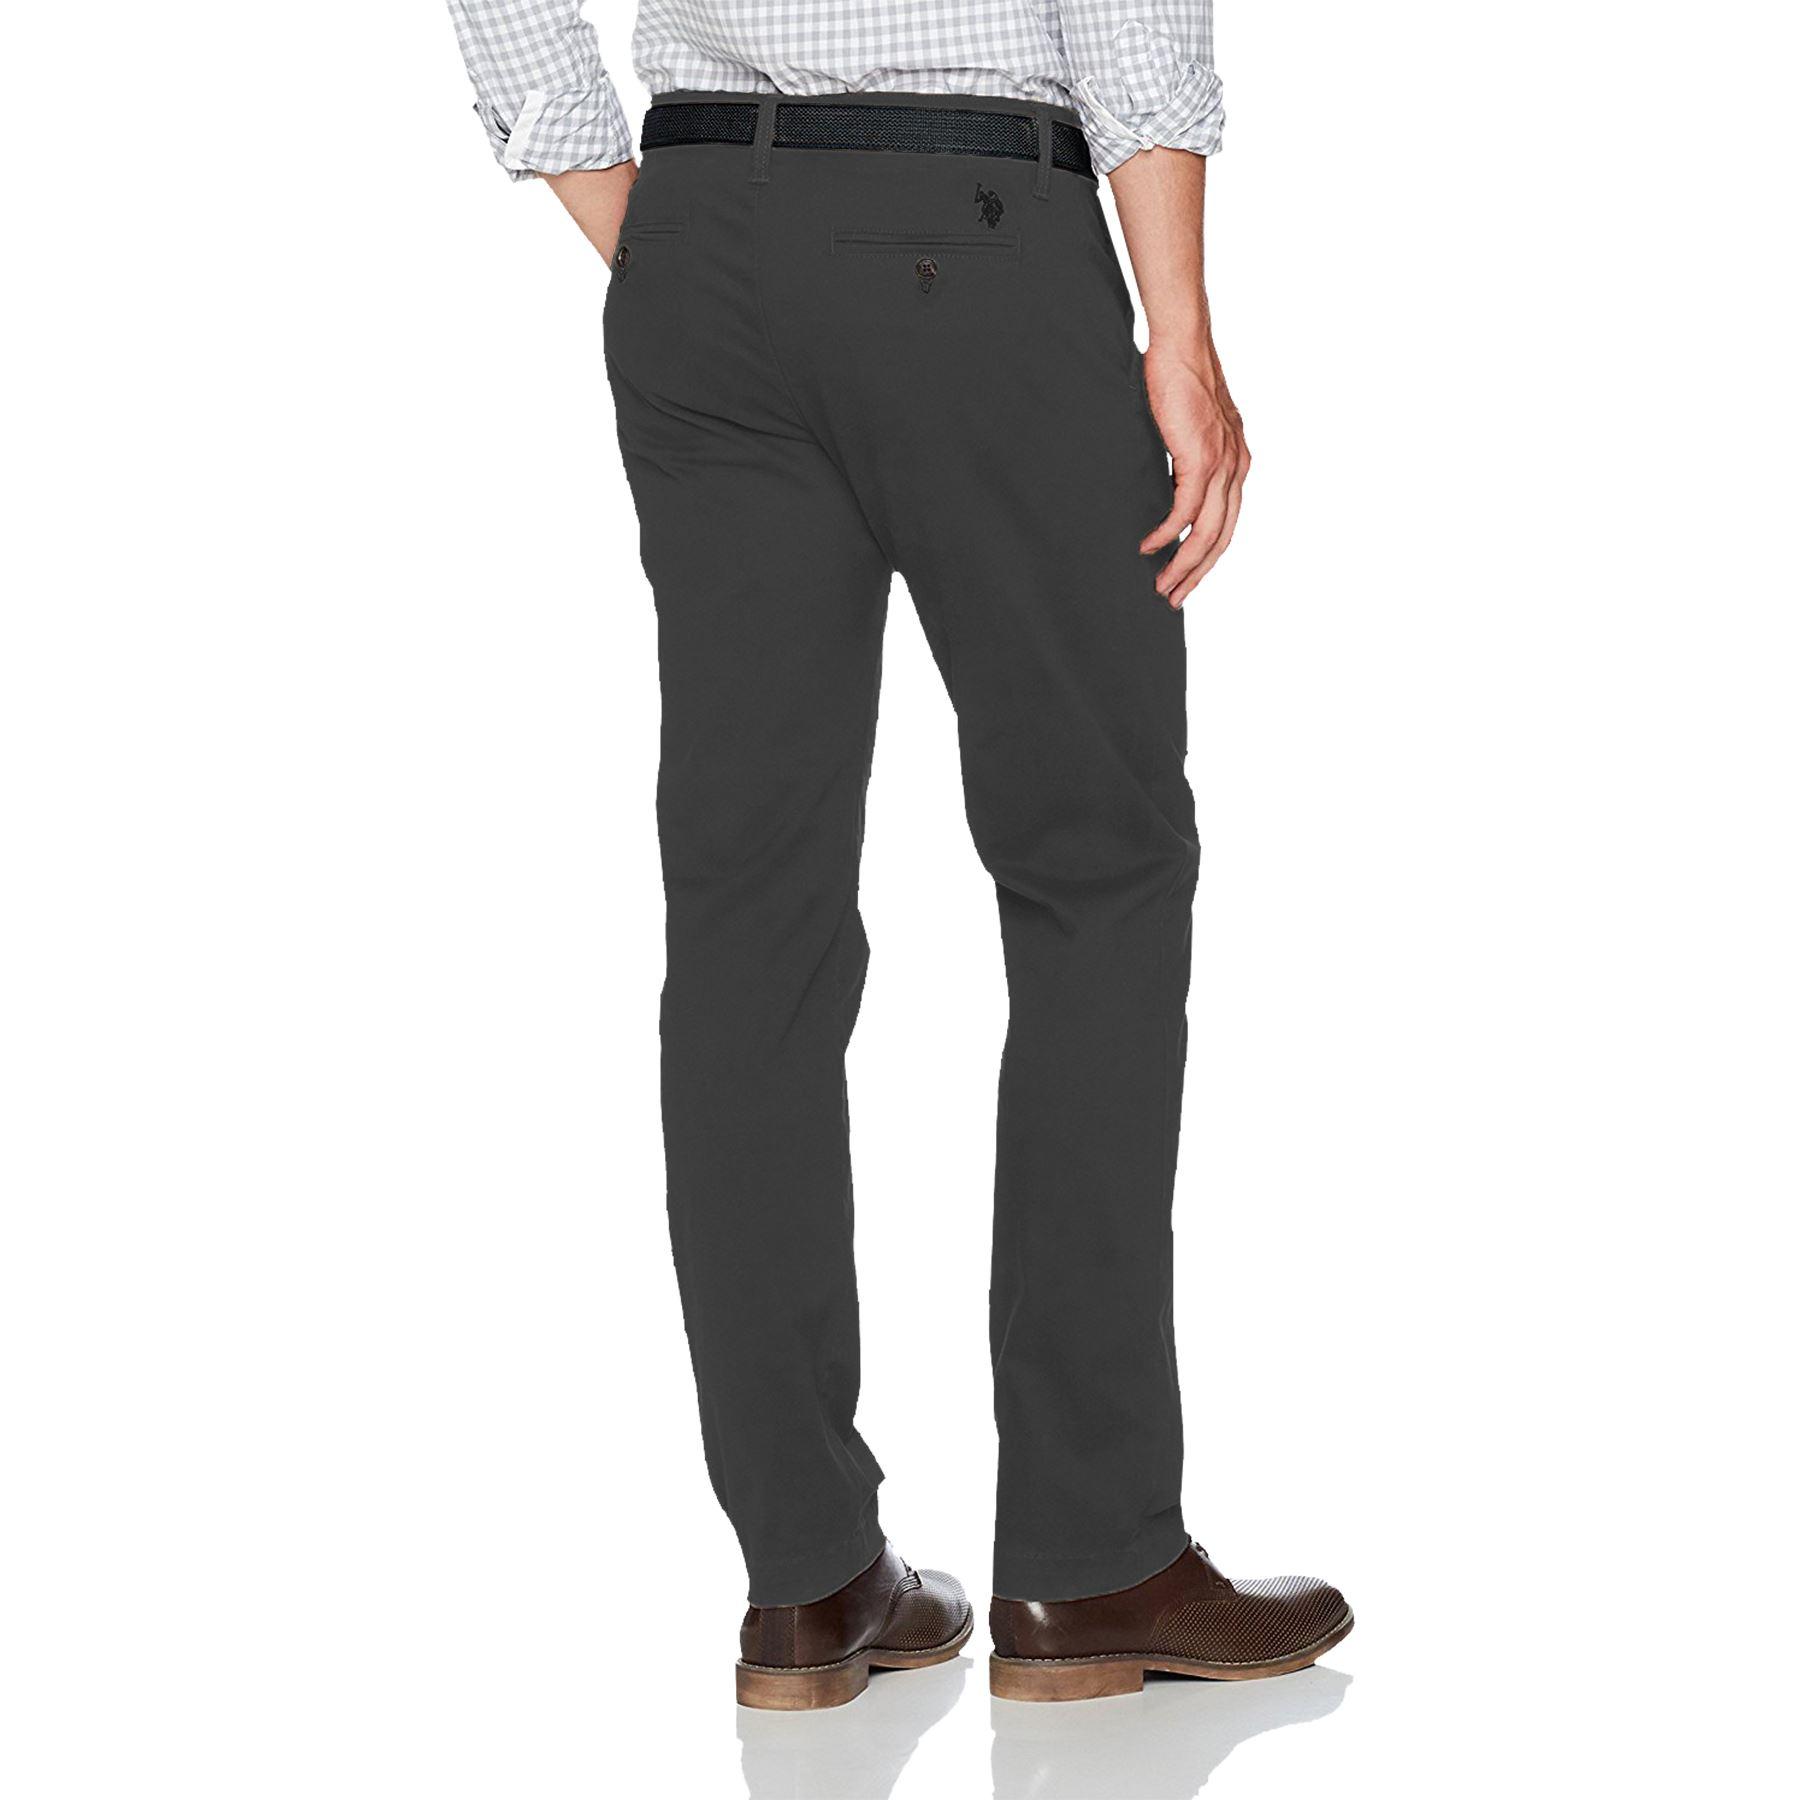 Para-Hombres-Pantalones-Regular-Fit-Straight-Chino-De-Algodon-Informales-Pantalones-de-trabajo miniatura 7